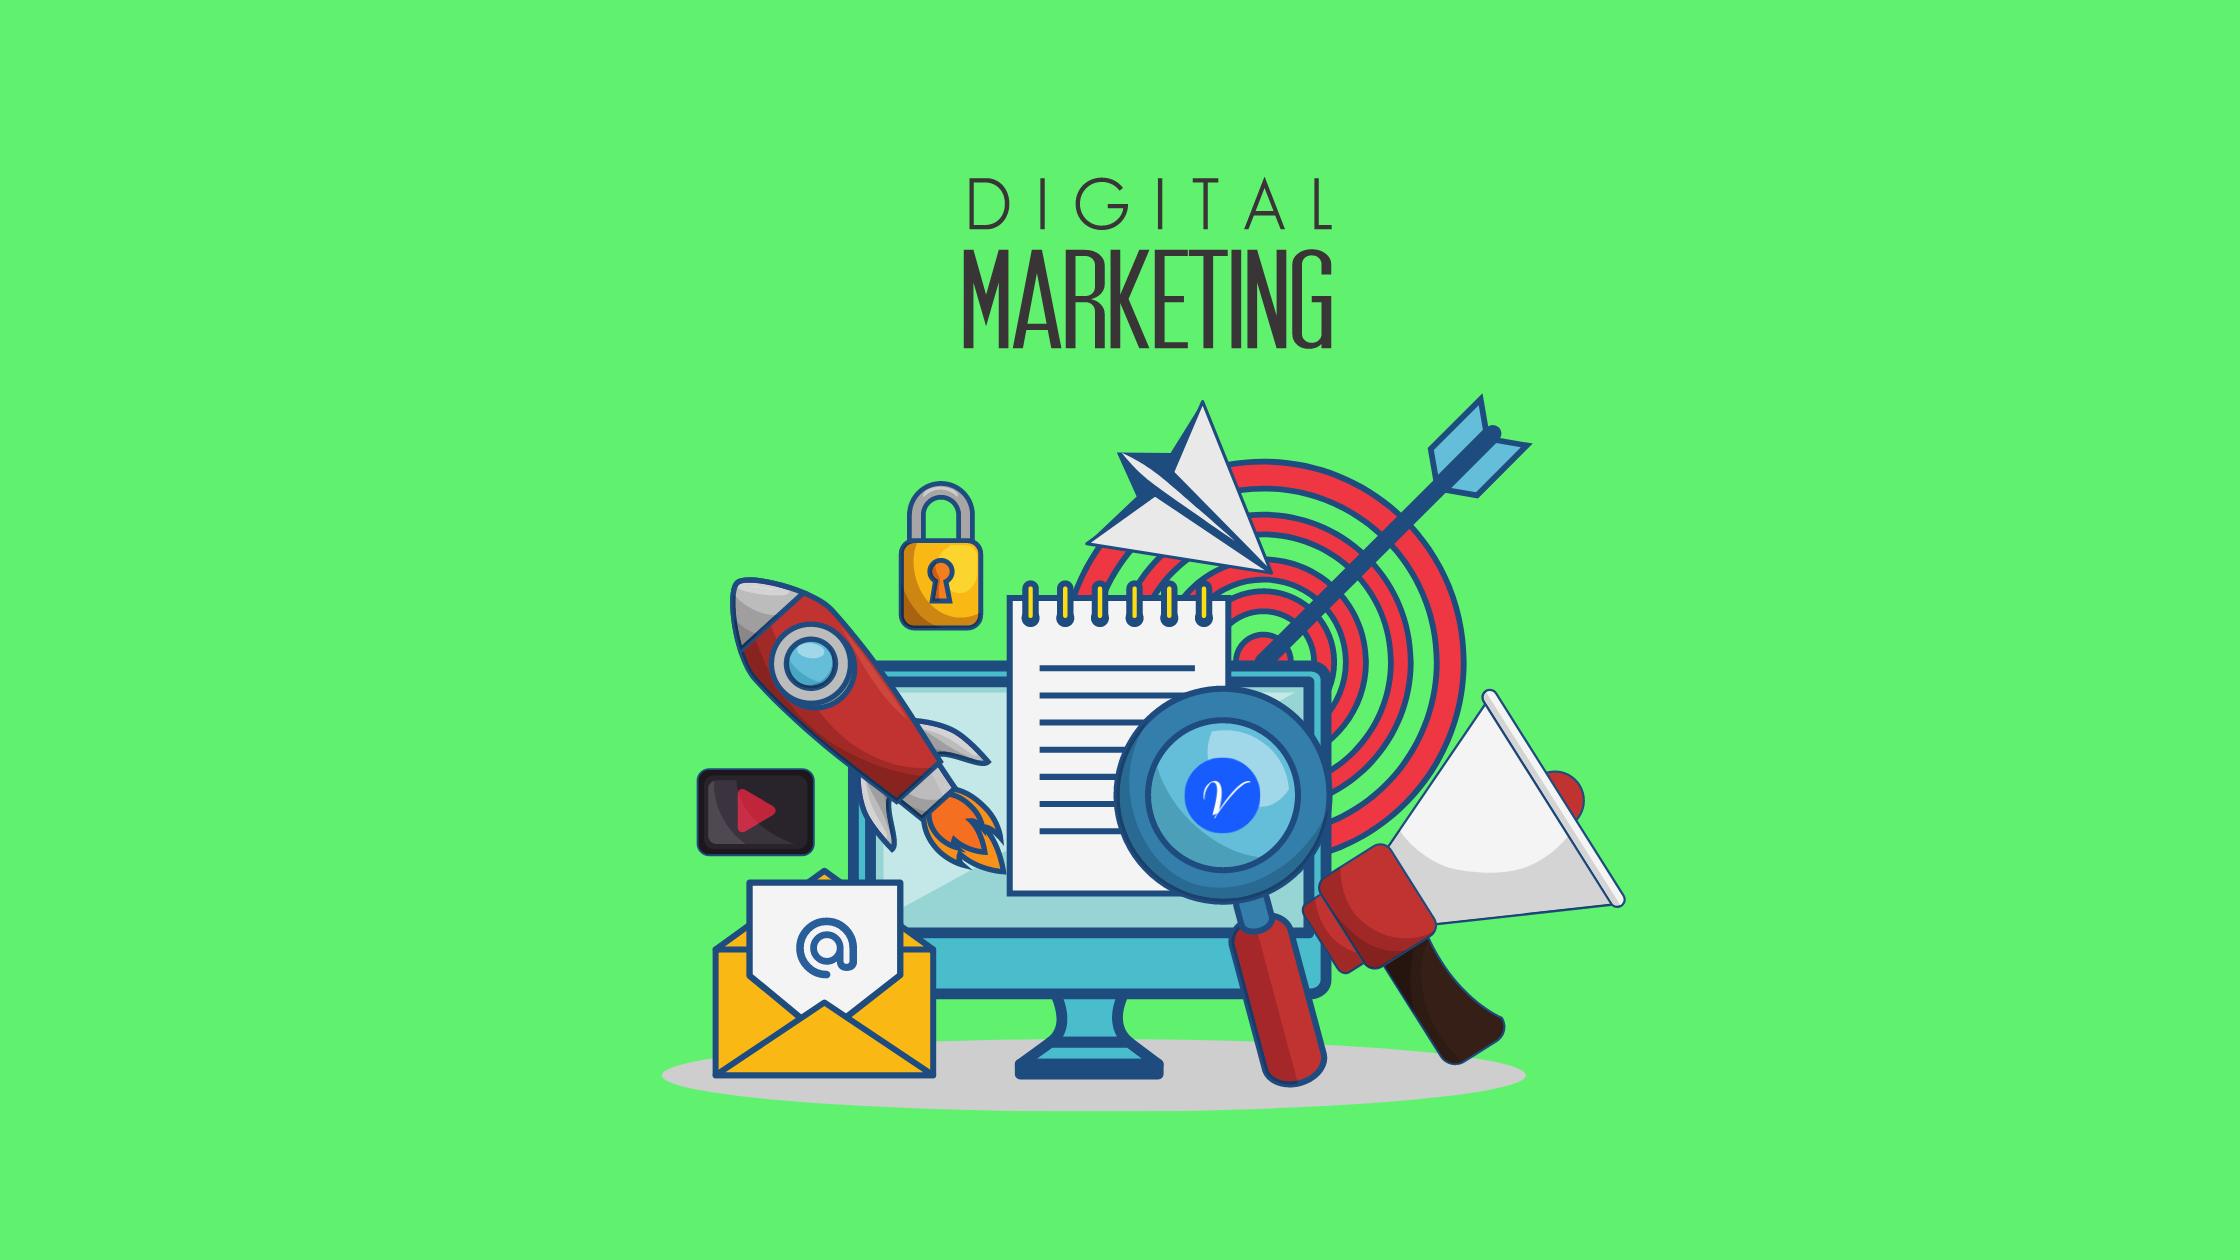 Increase-Conversion-Rate-in-Digital-Marketing.png